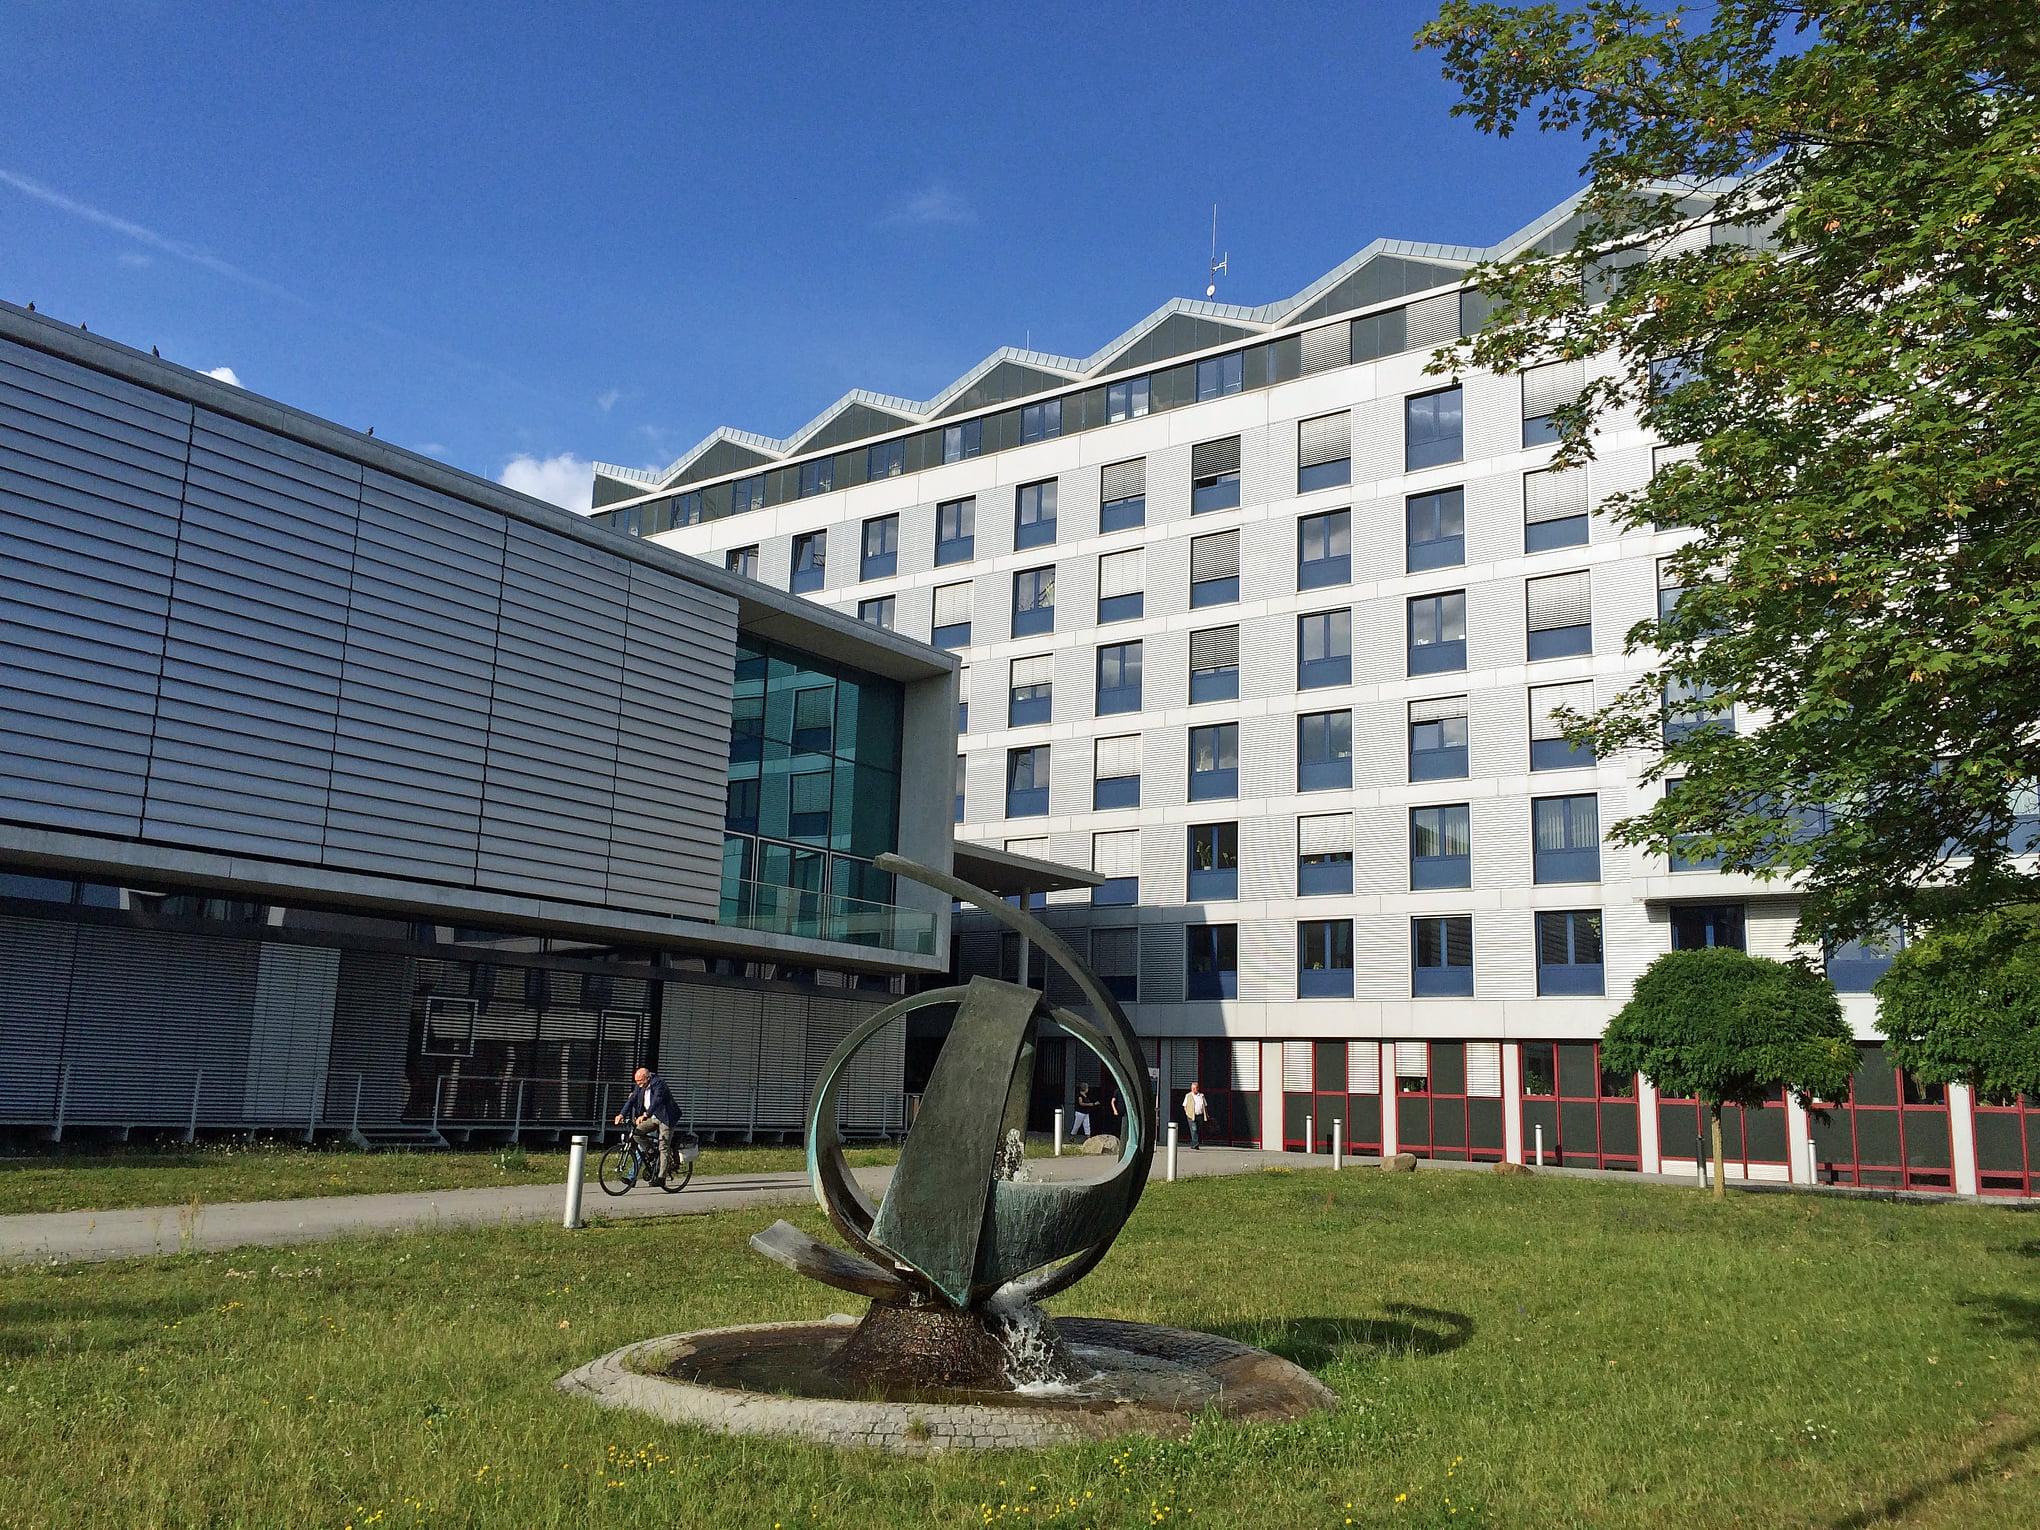 Landratsamt Groß-Gerau - Foto: Achim Weidner